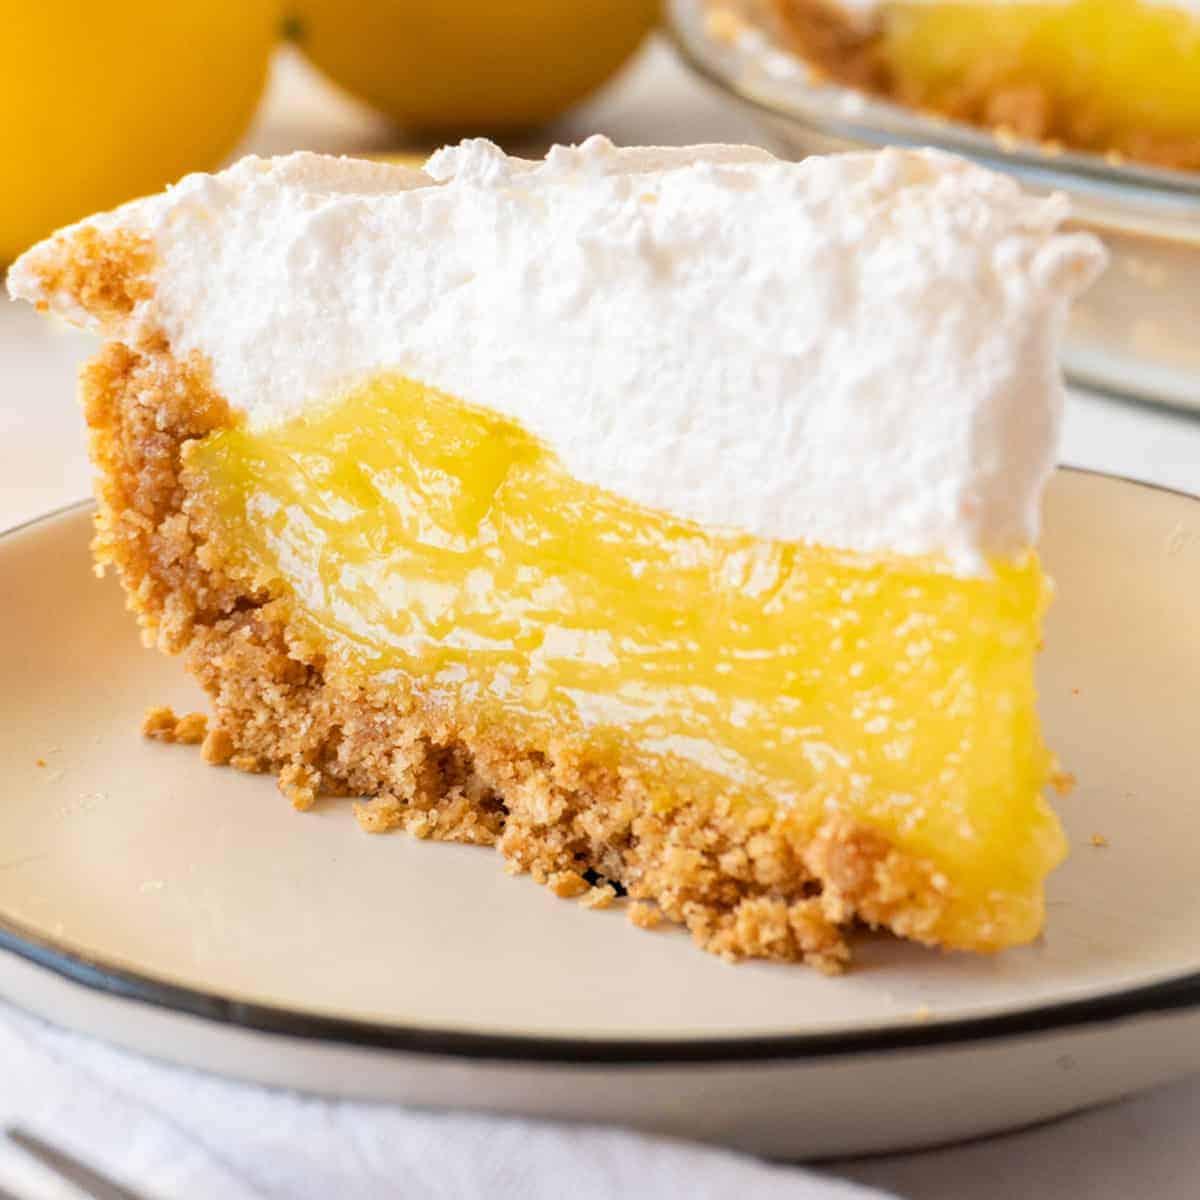 slice of lemon meringue pie featured image